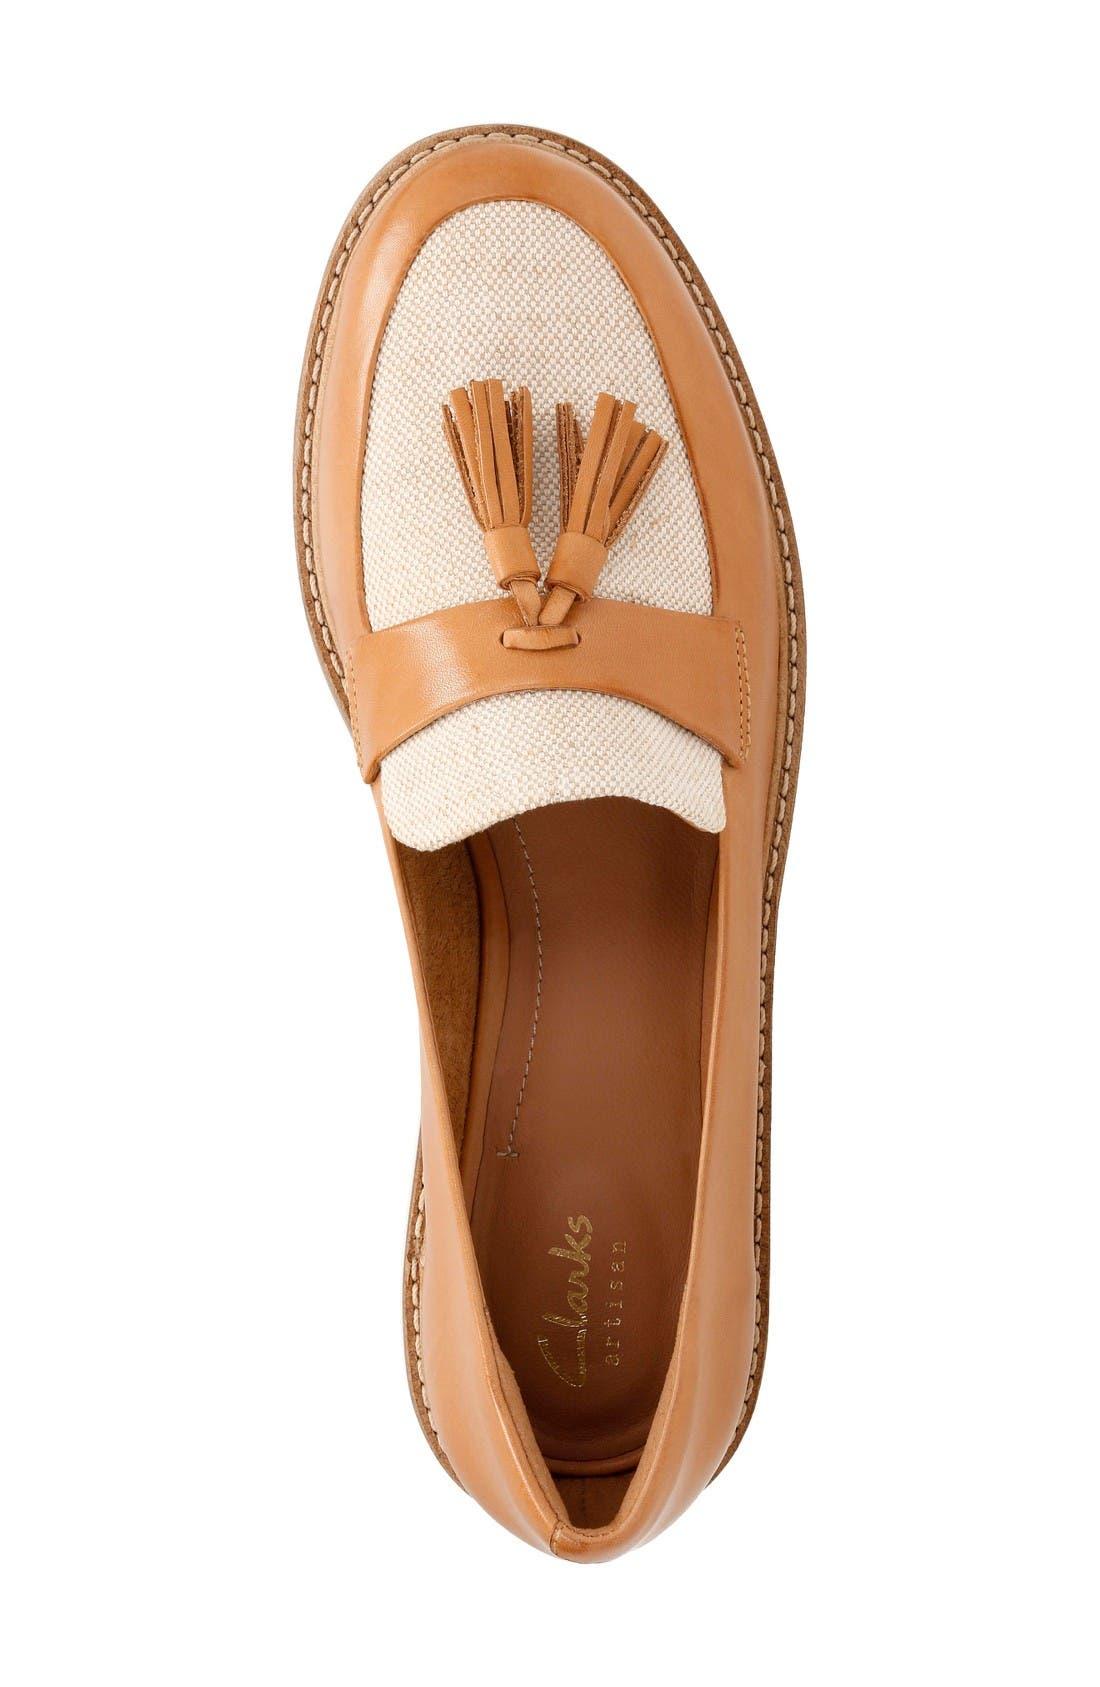 Glick Castine Tassel Loafer,                             Alternate thumbnail 4, color,                             Light Tan Leather